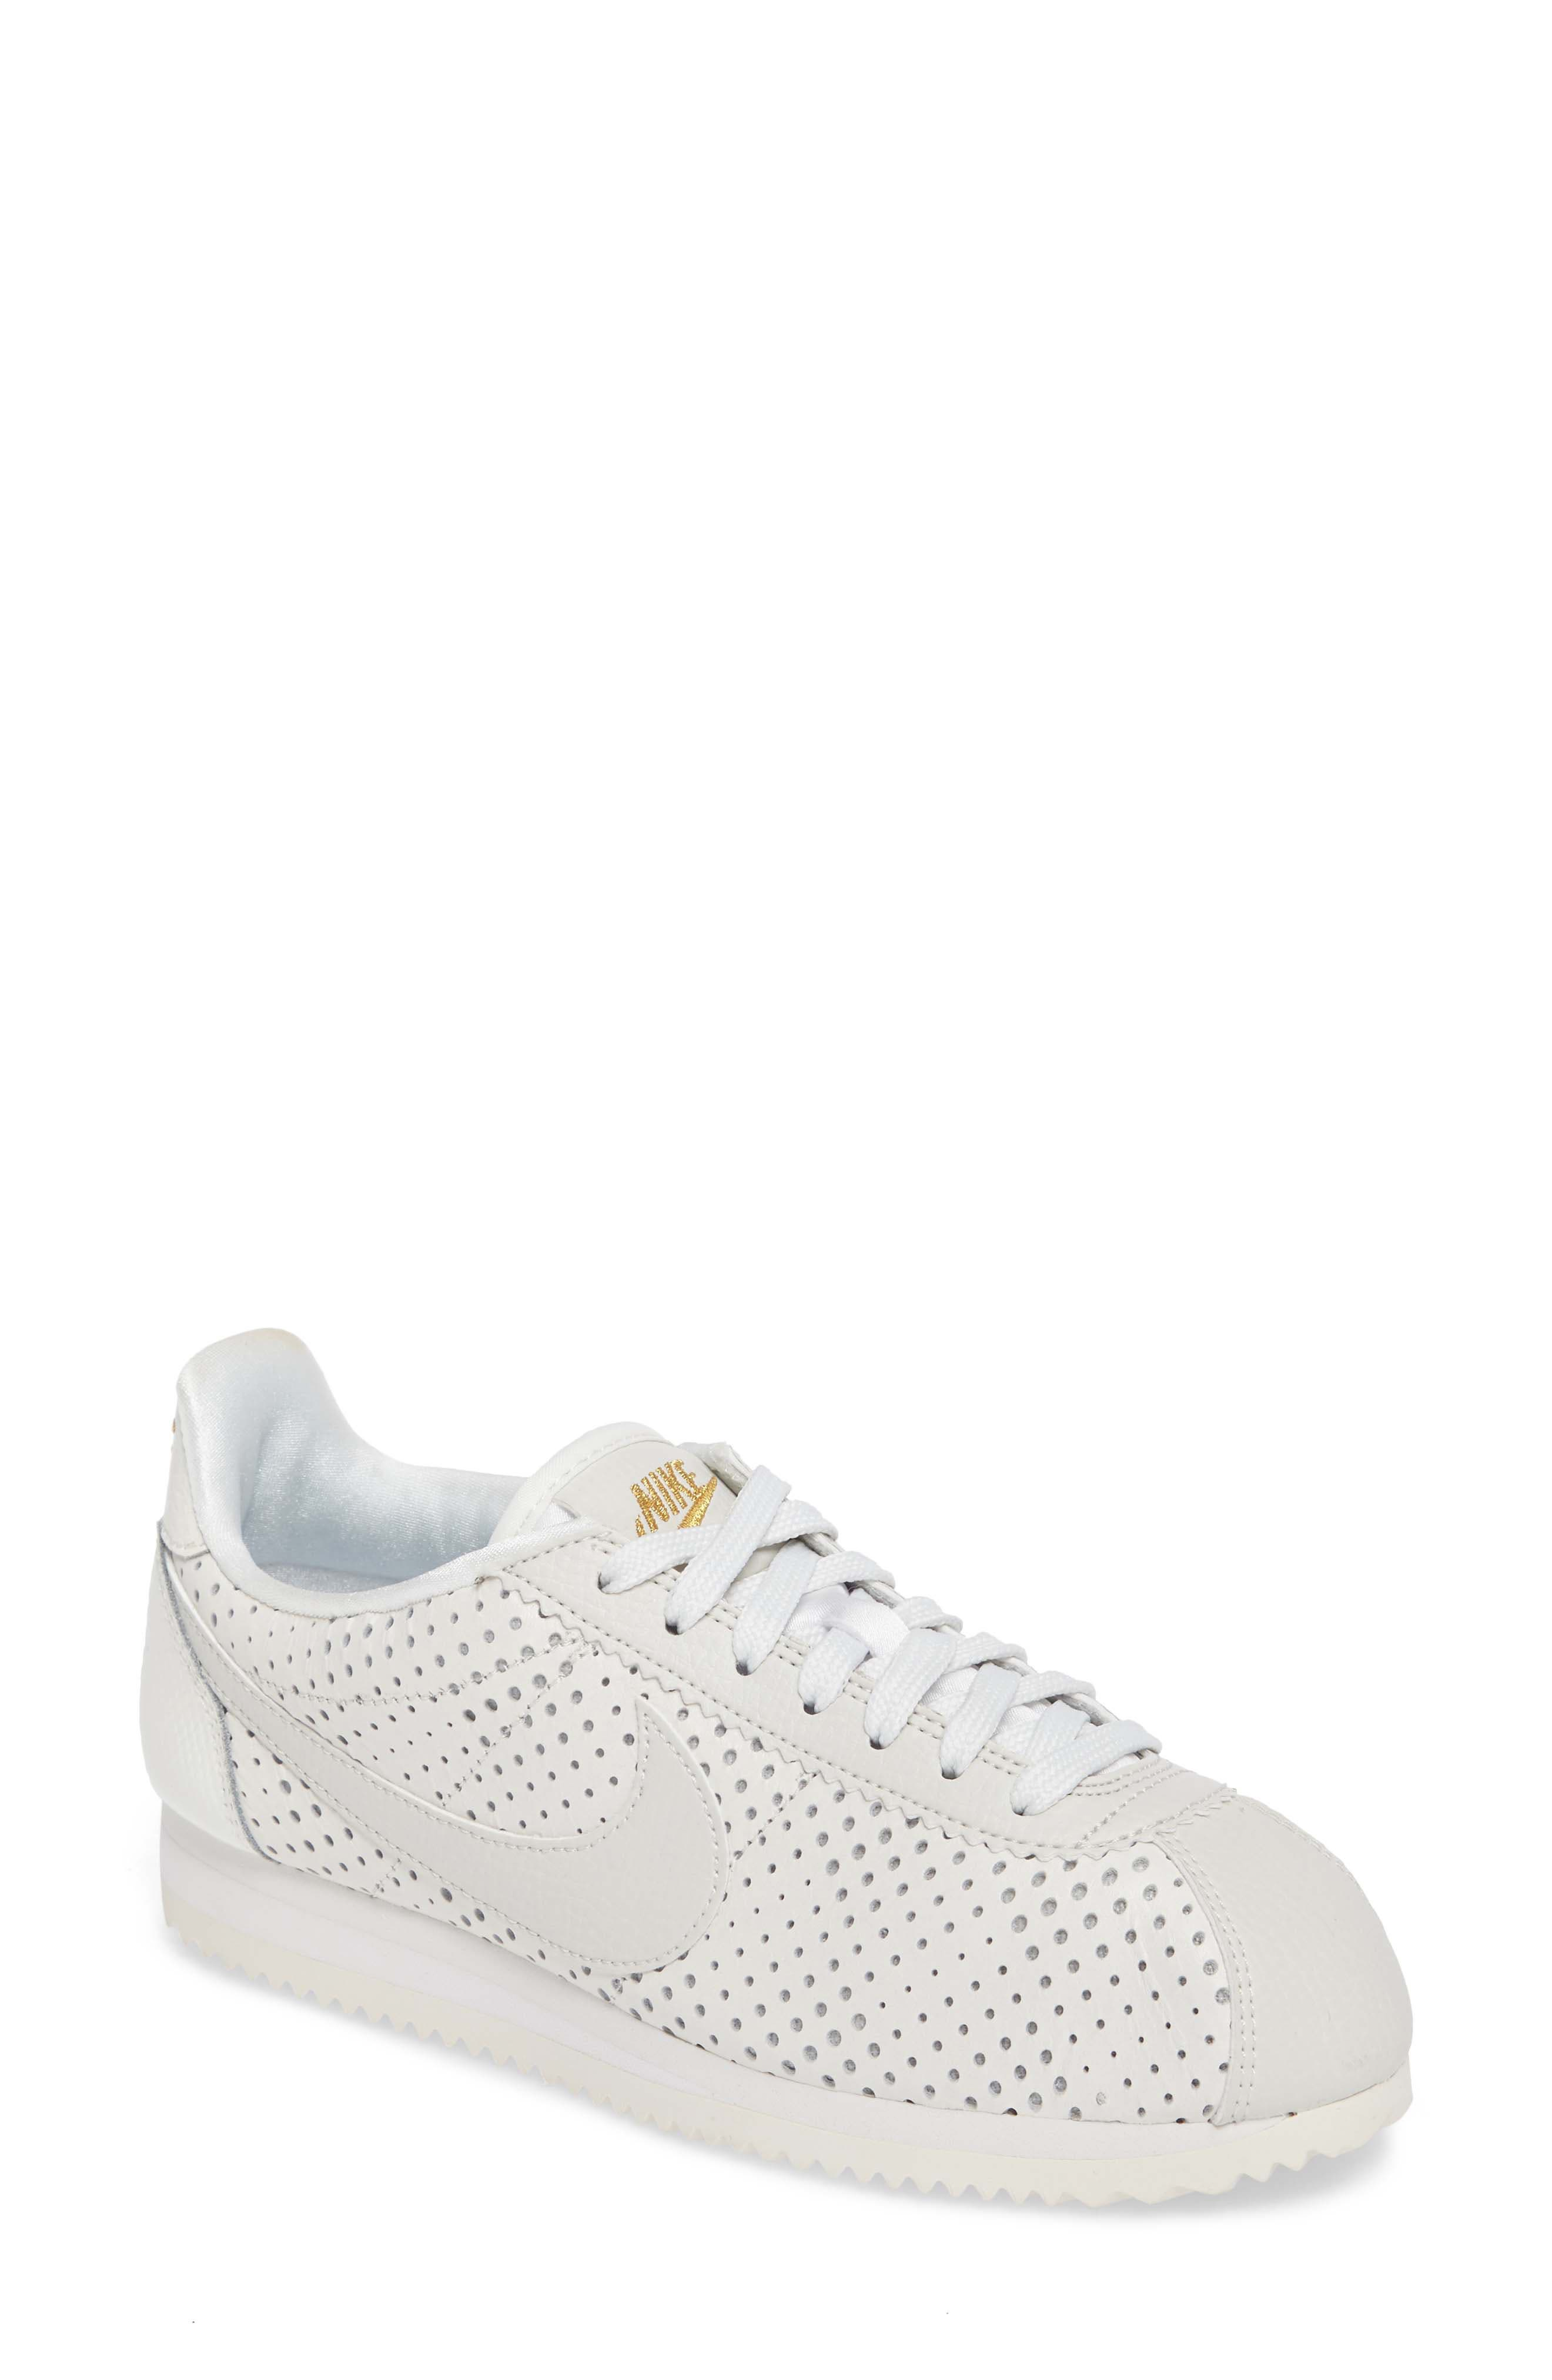 Nike Cortez Classic SE PRM Sneaker (Women)